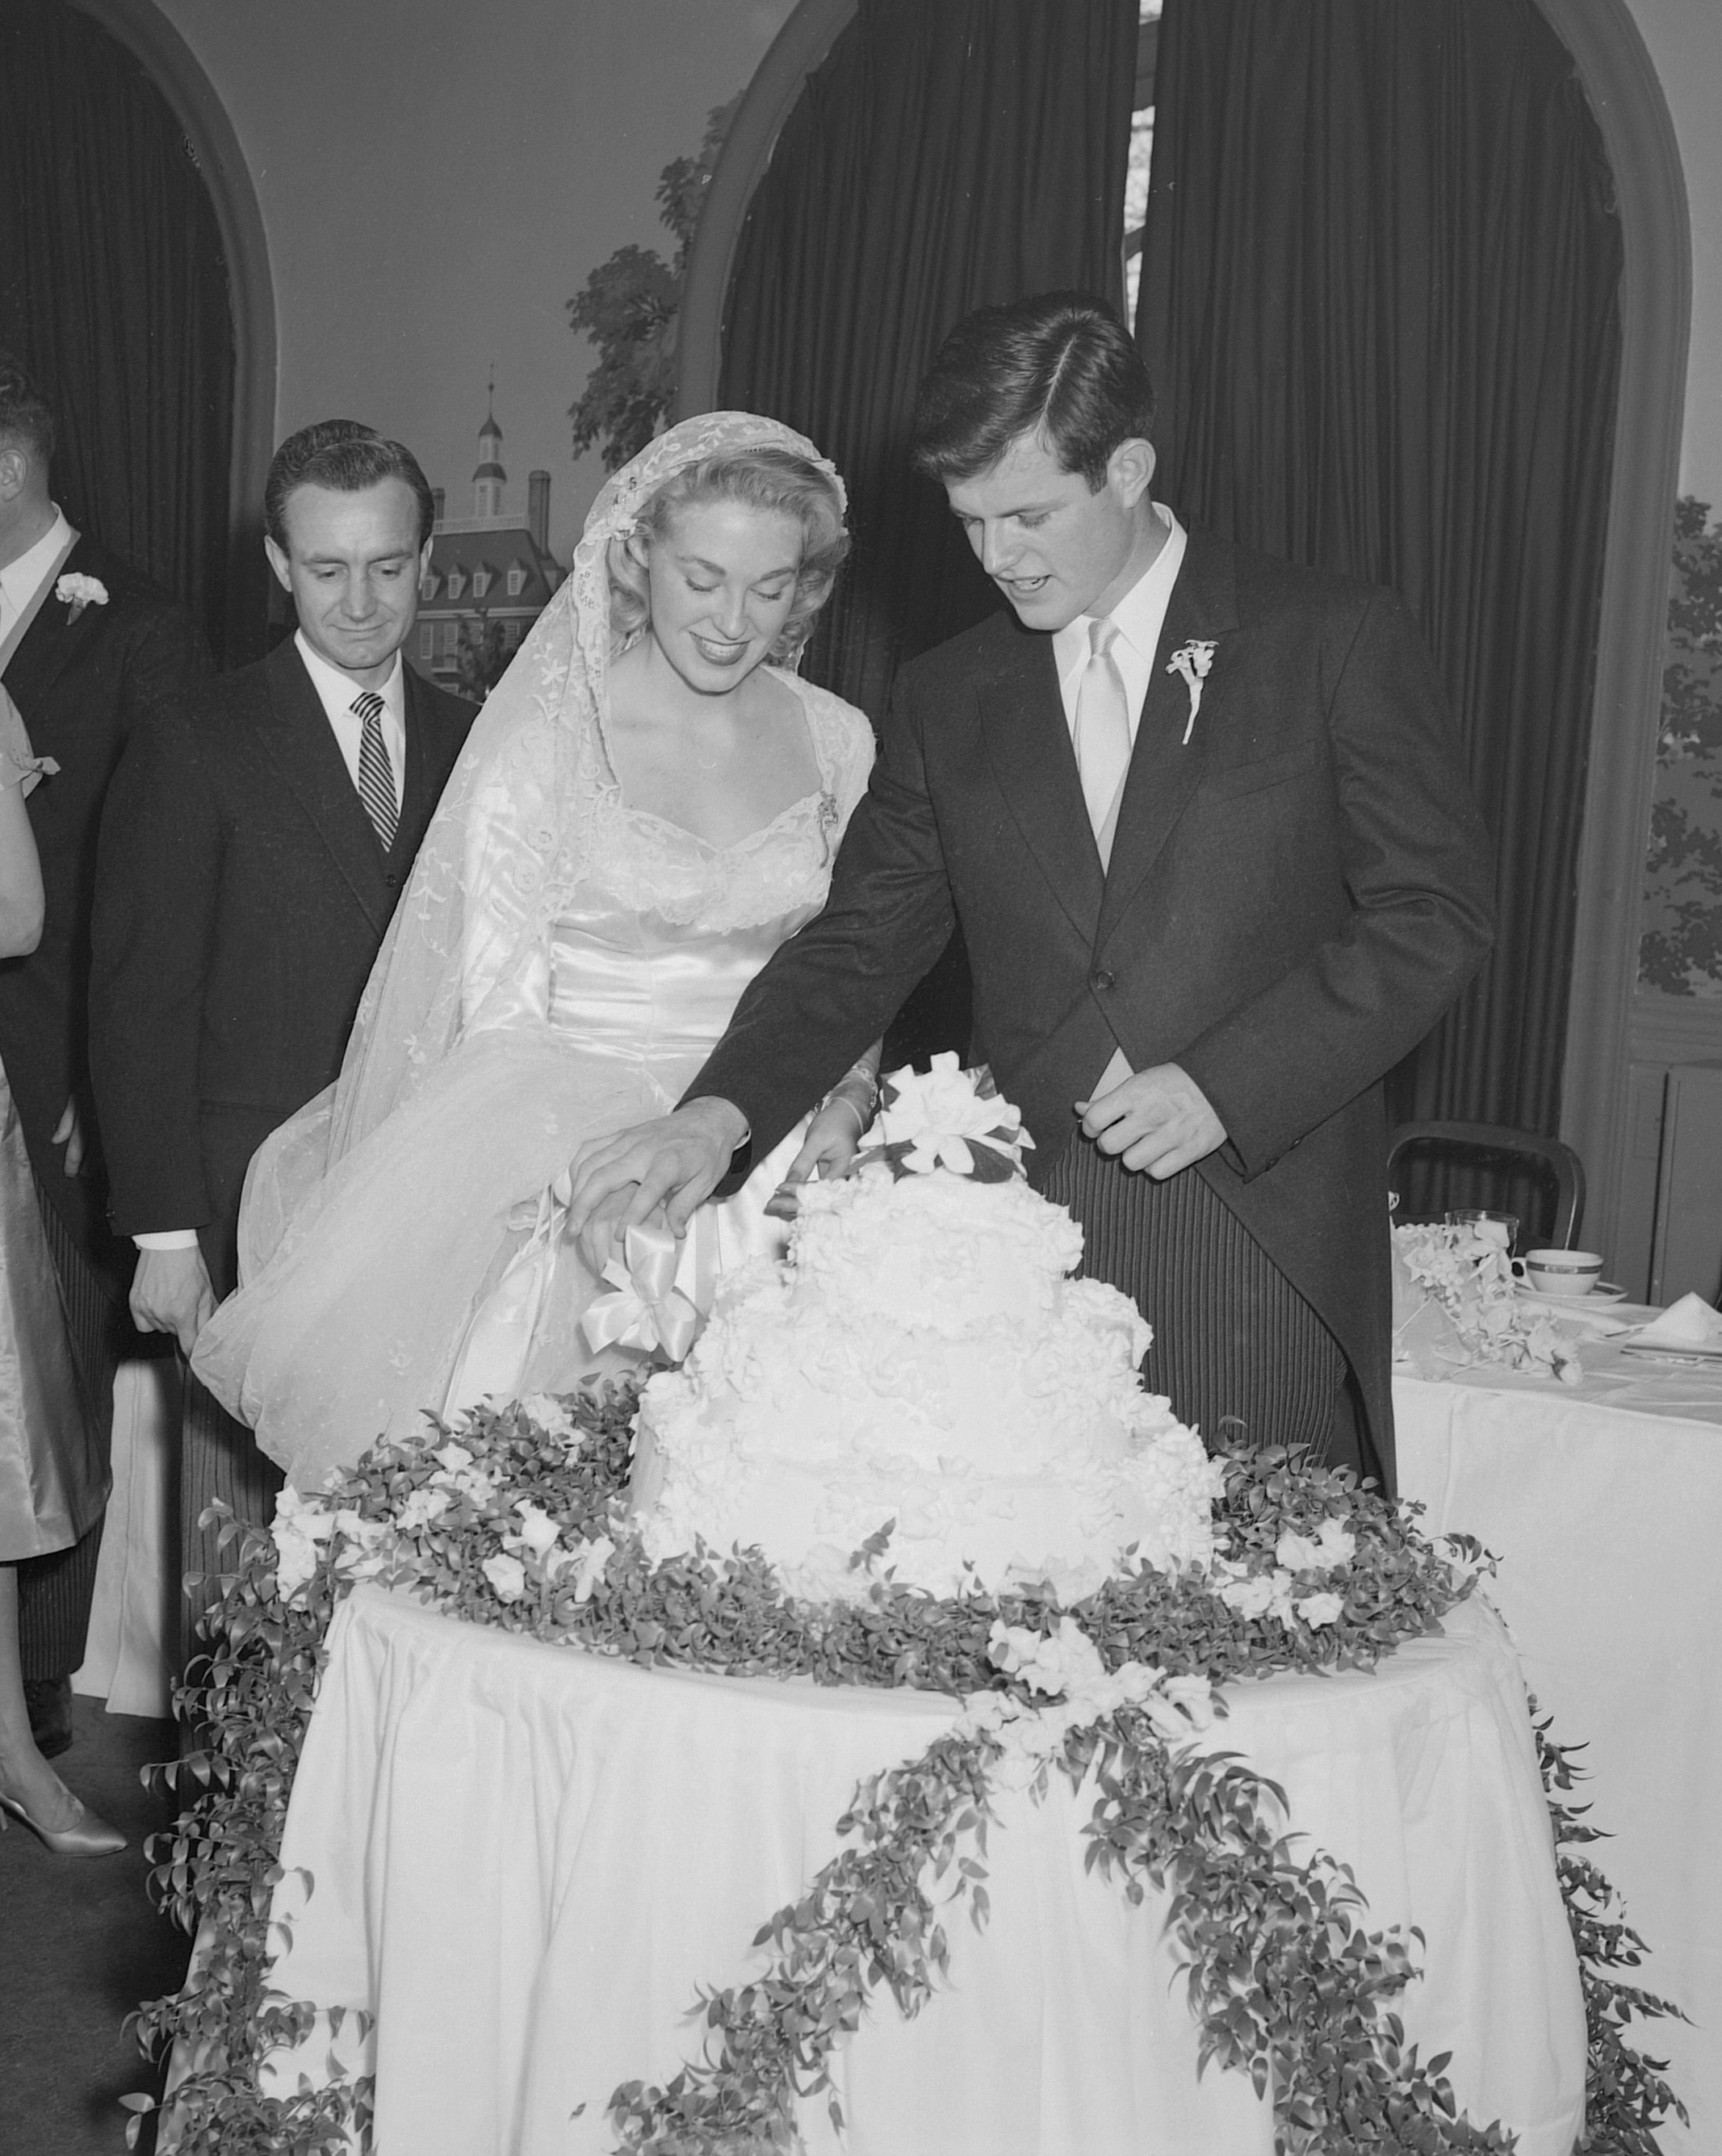 celebrity-vintage-wedding-cakes-ted-kennedy-83931385-1015.jpg